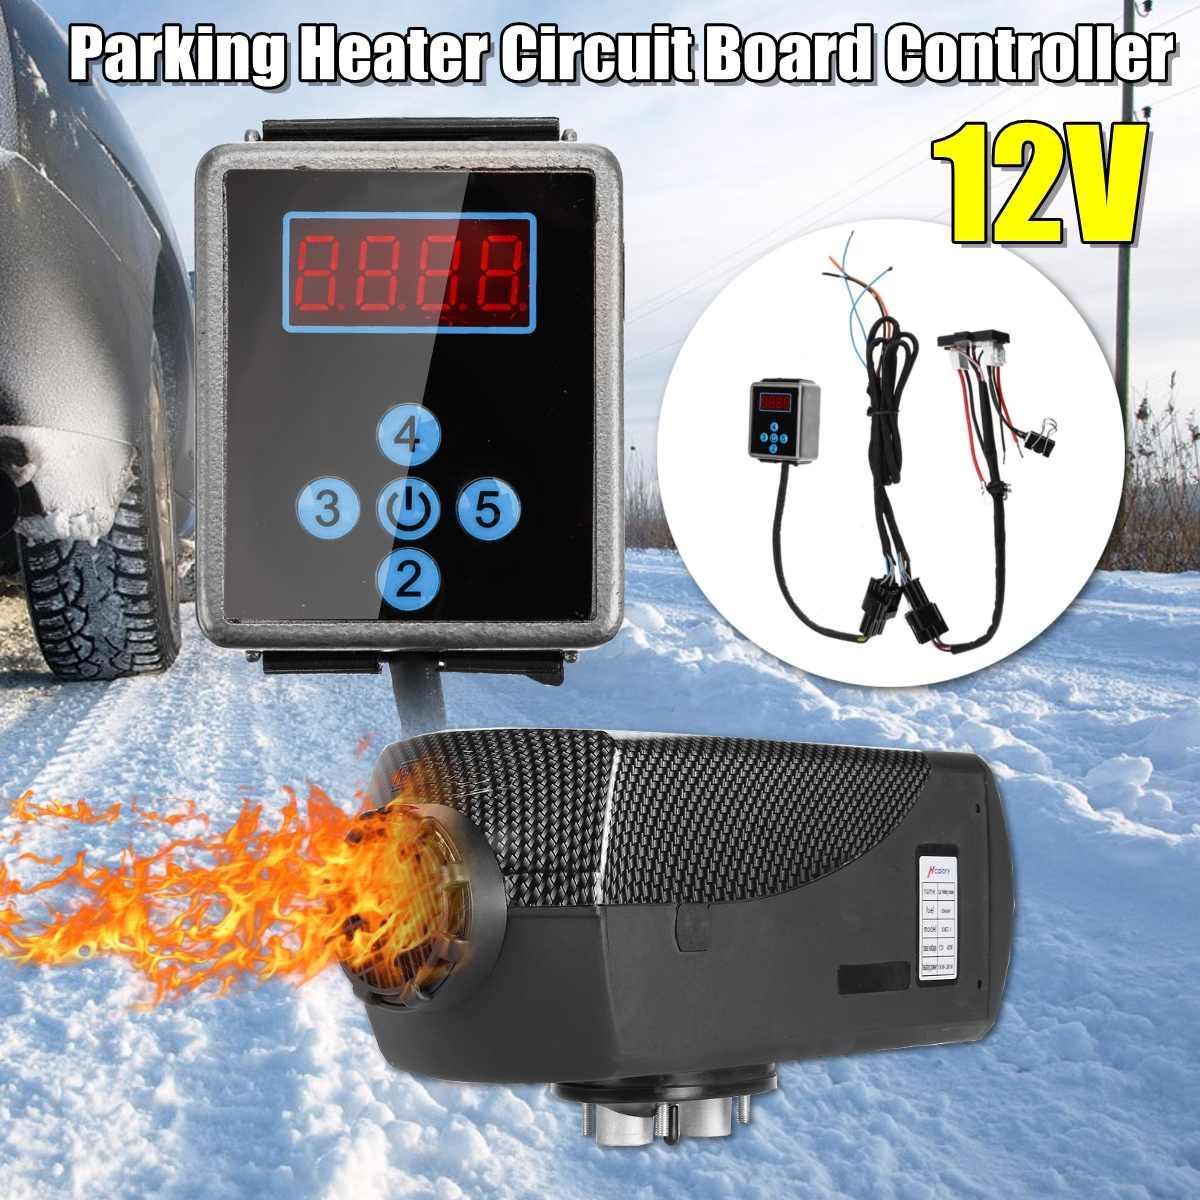 Universal 12V 24V 1 zu 8kw Circuit Control Motherboard Bord Controller Für Luft Standheizung